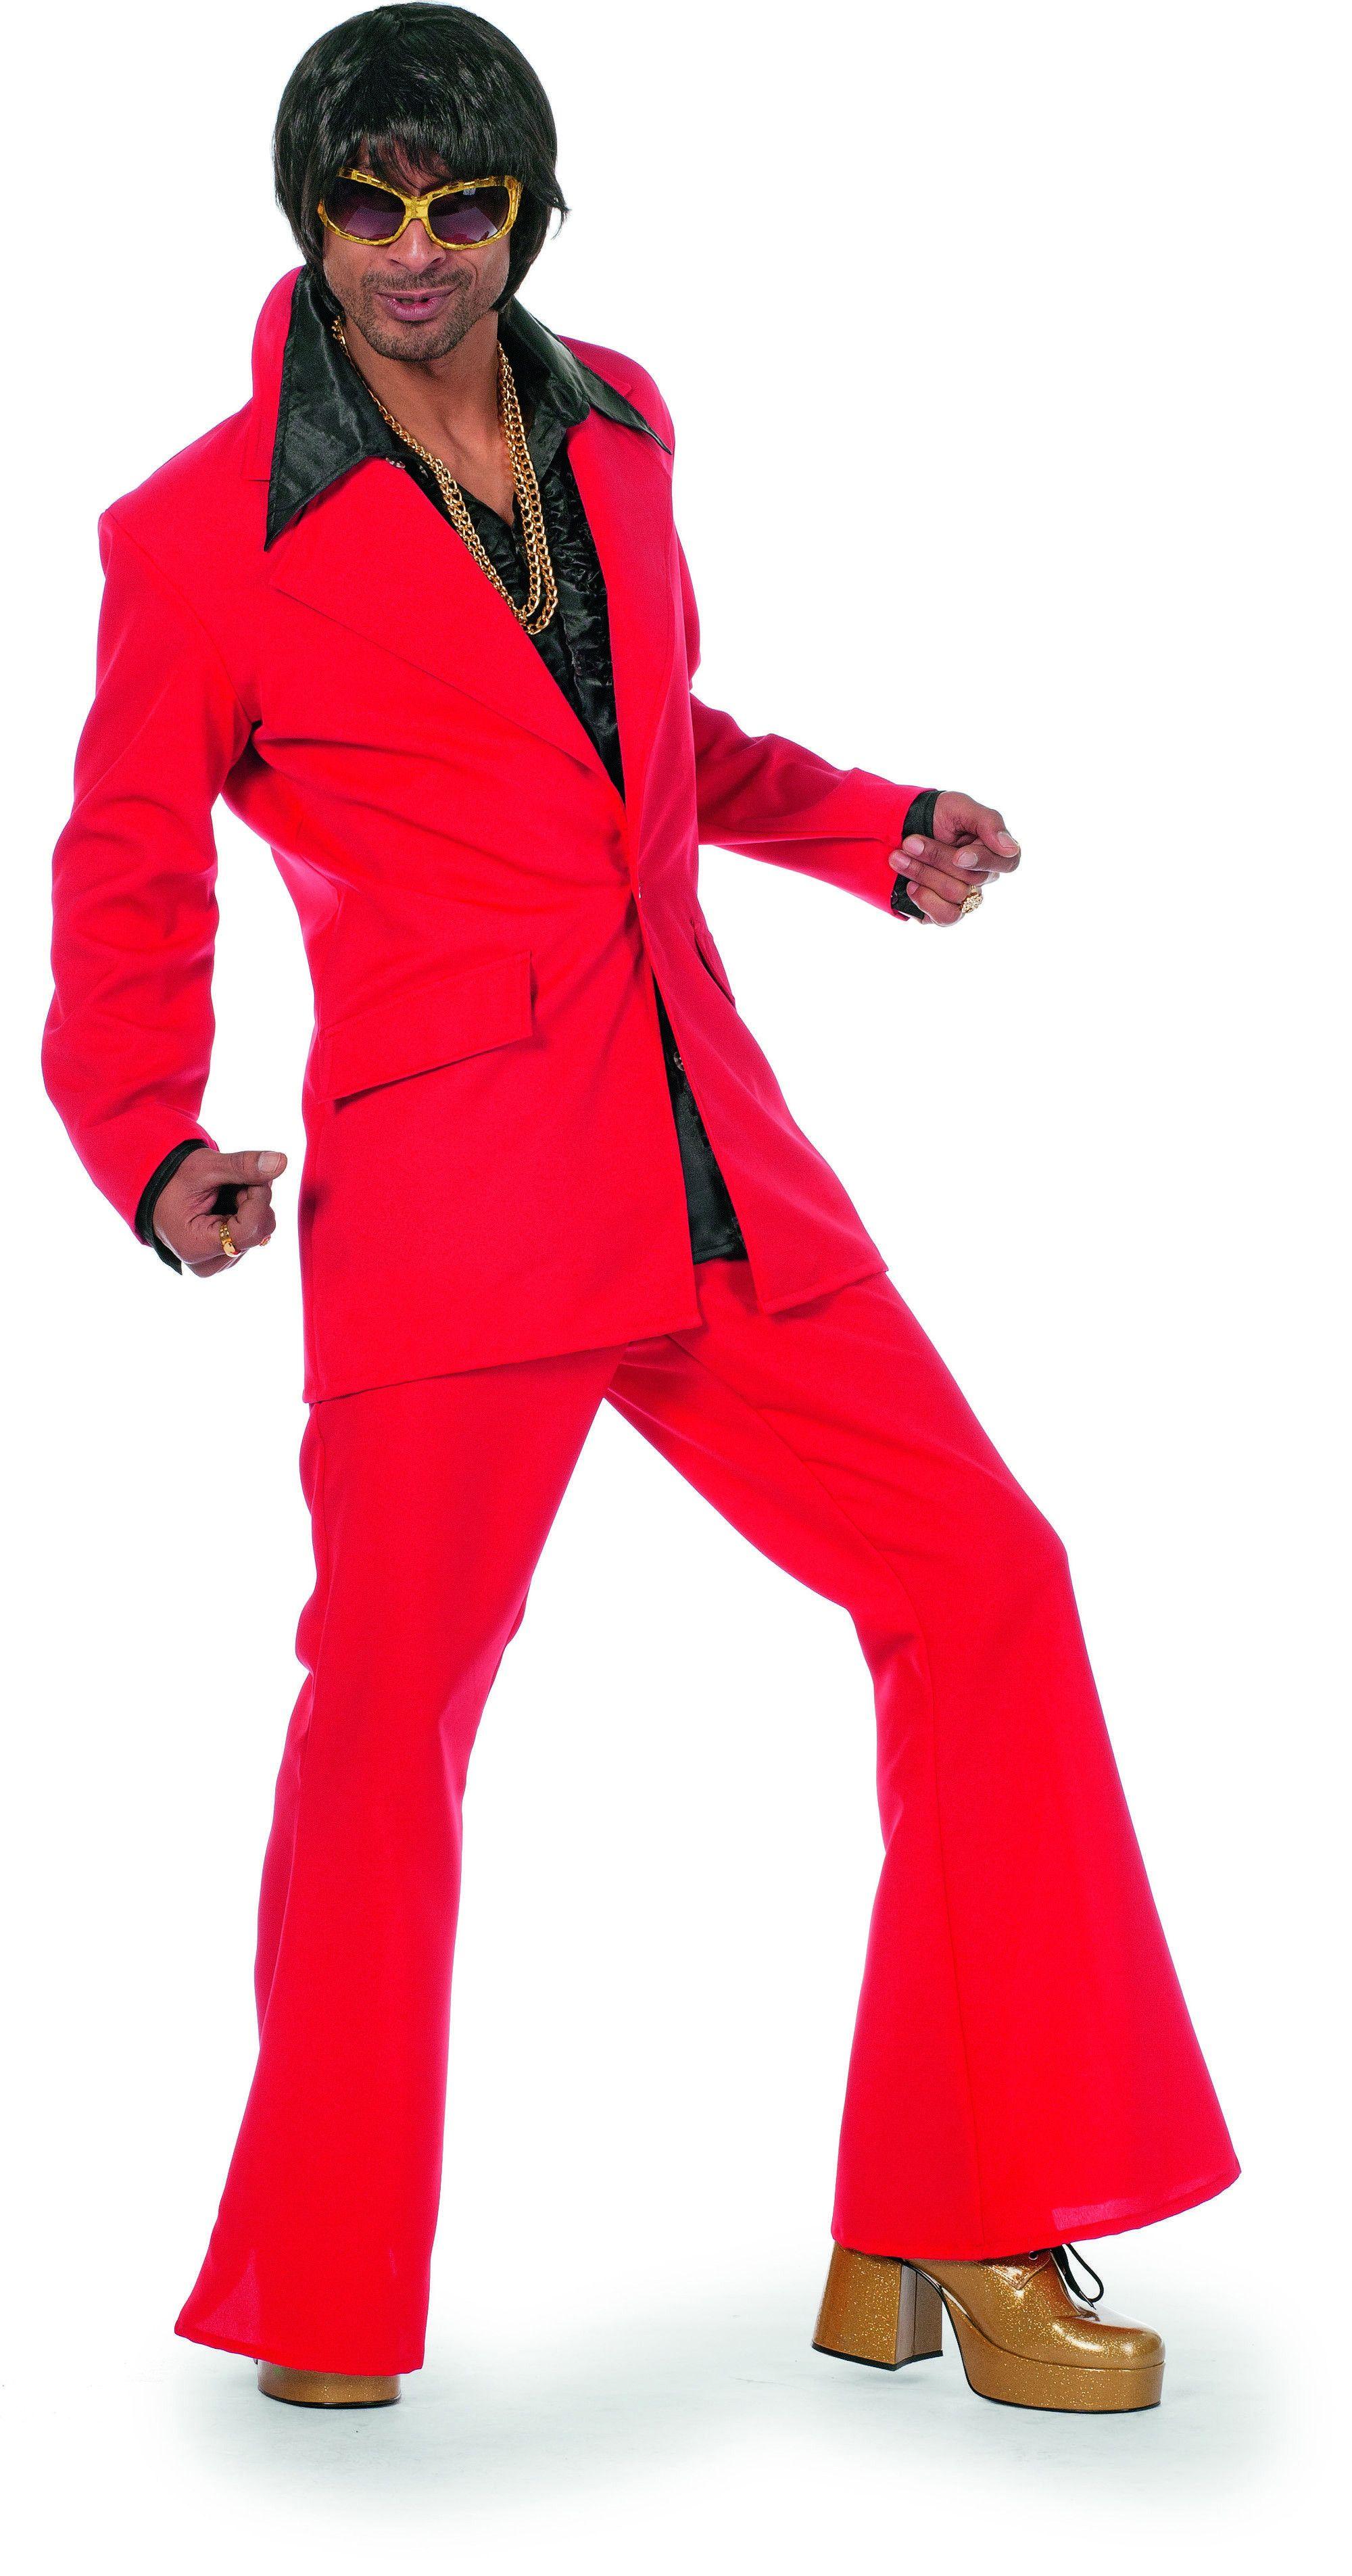 Dancing Rood Disco Fever Man Kostuum